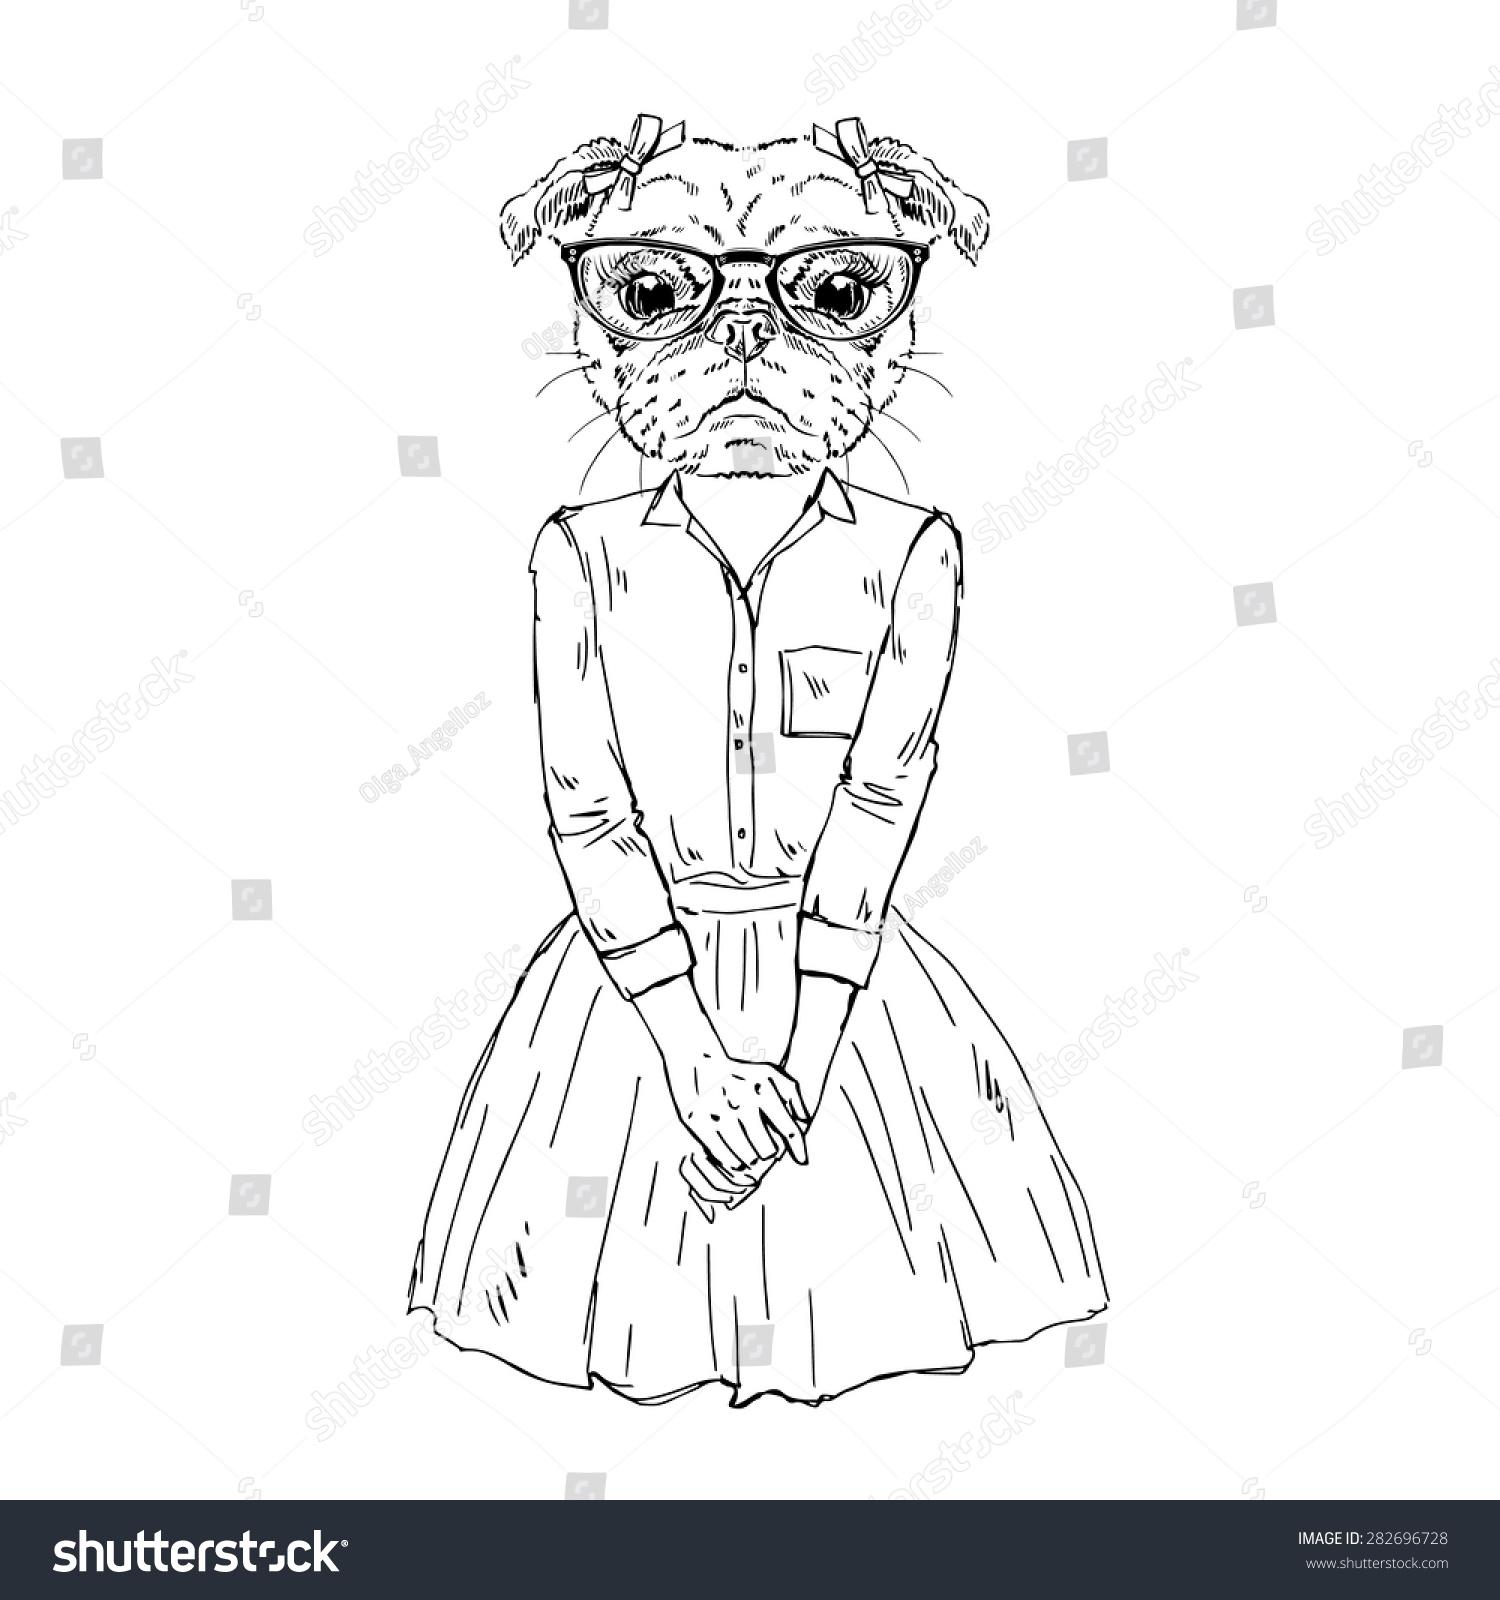 Fashion Animal Illustration Anthropomorphic Design Furry Art Hand Drawn Of Pug Doggy